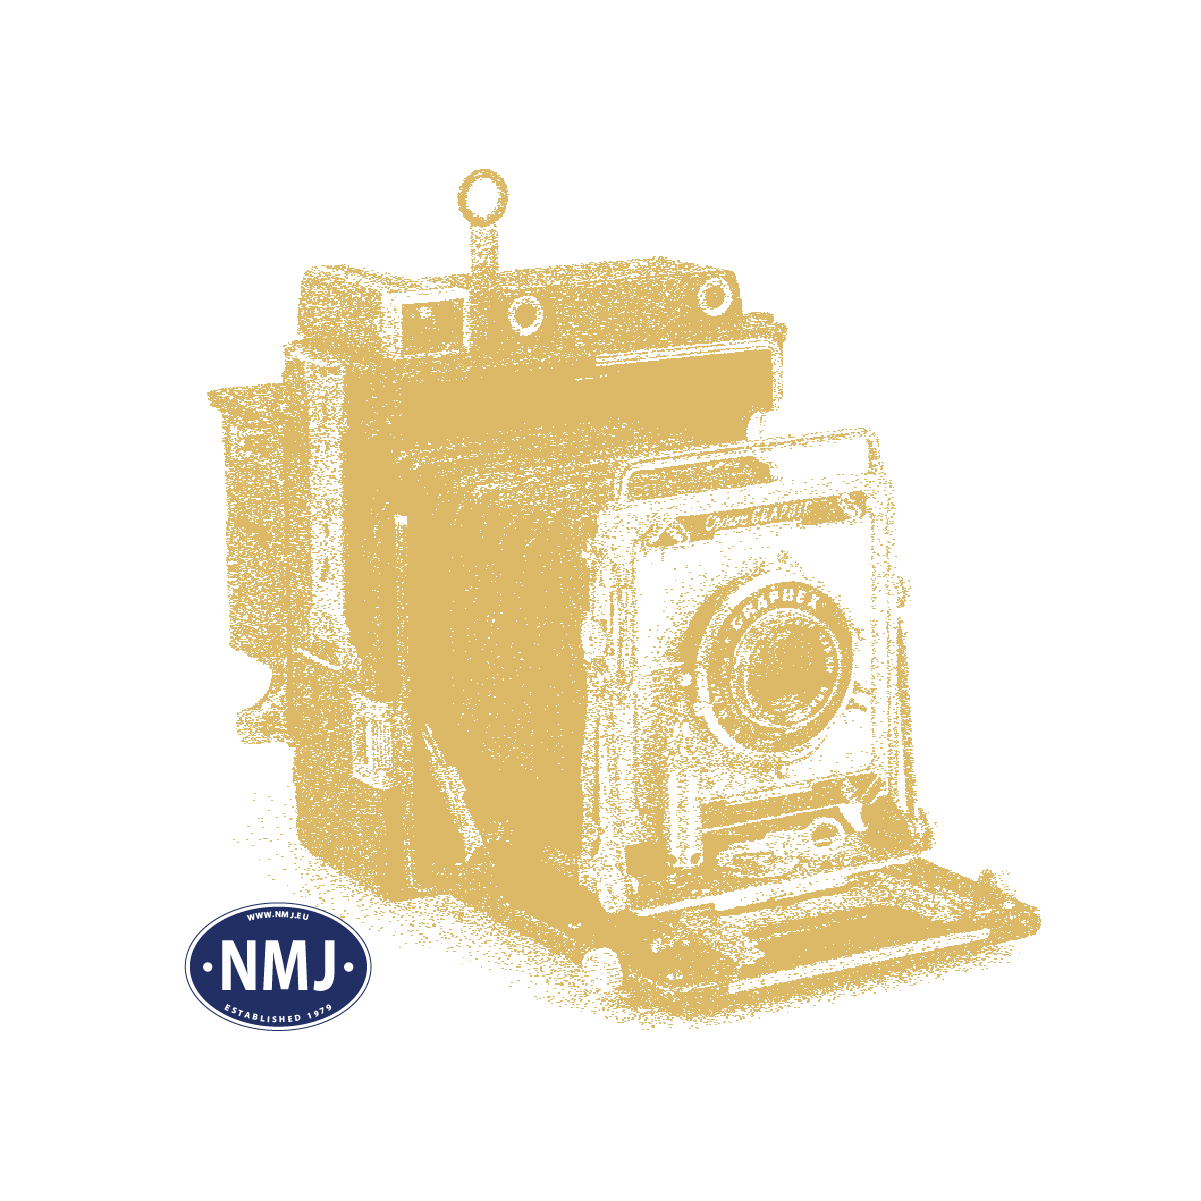 NMJT94001 - NMJ Topline SJ Y1 1309, Orange, DCC m/ Sound